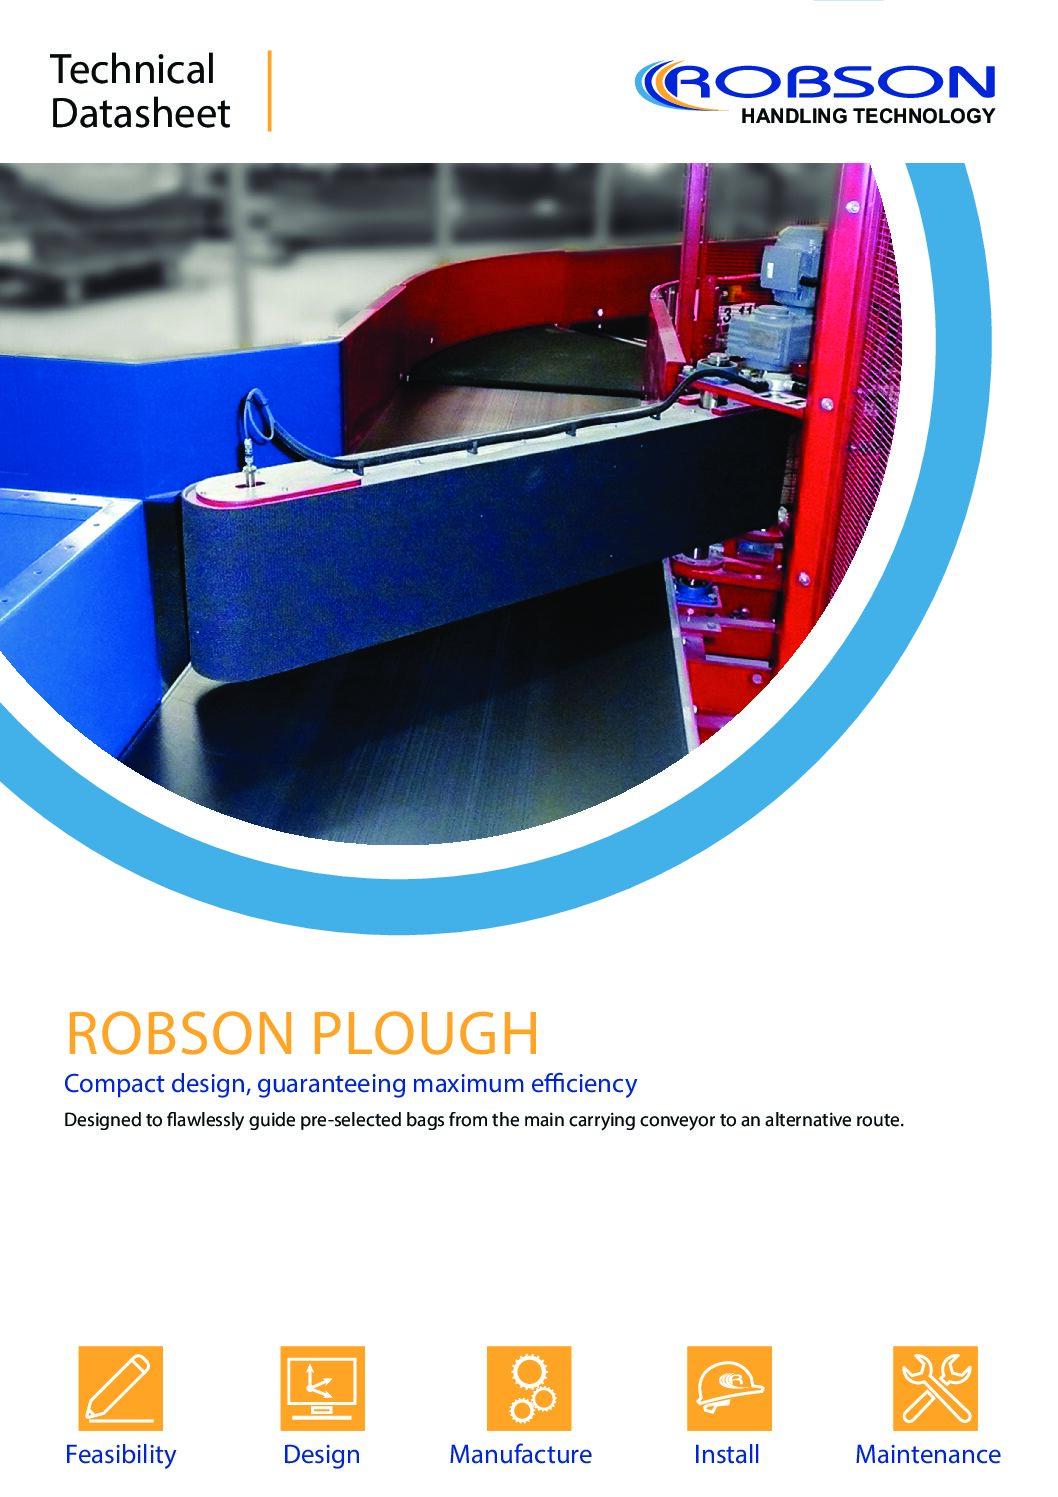 Robson Plough Diverter